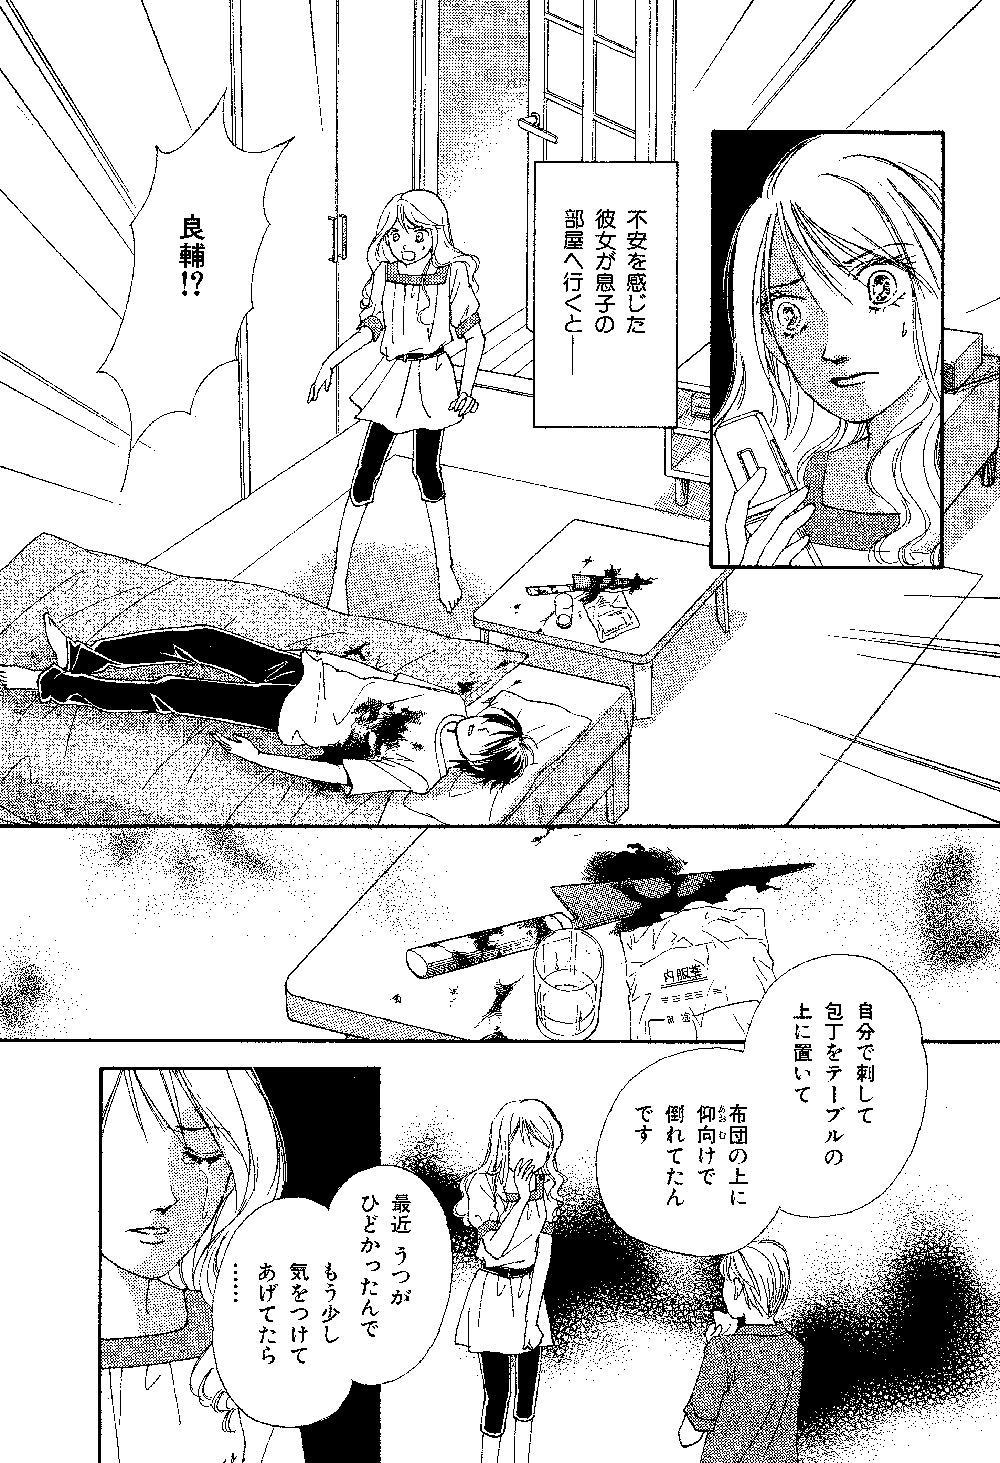 mayuri_0001_0022.jpg